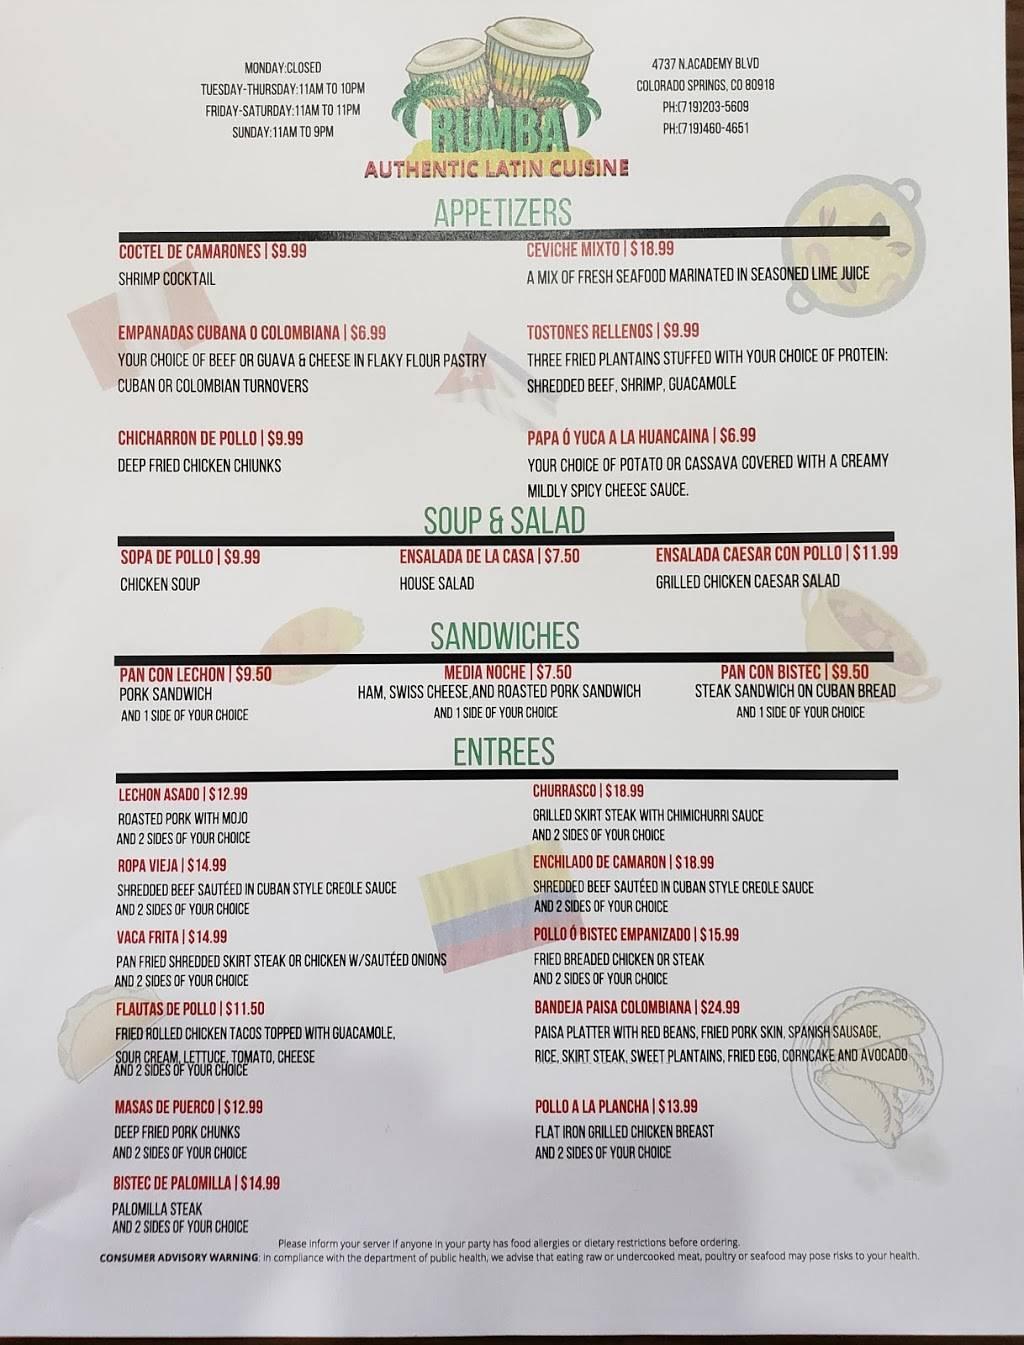 Rumba- Latin Cuisine   restaurant   4737 N Academy Blvd, Colorado Springs, CO 80918, USA   7192035609 OR +1 719-203-5609